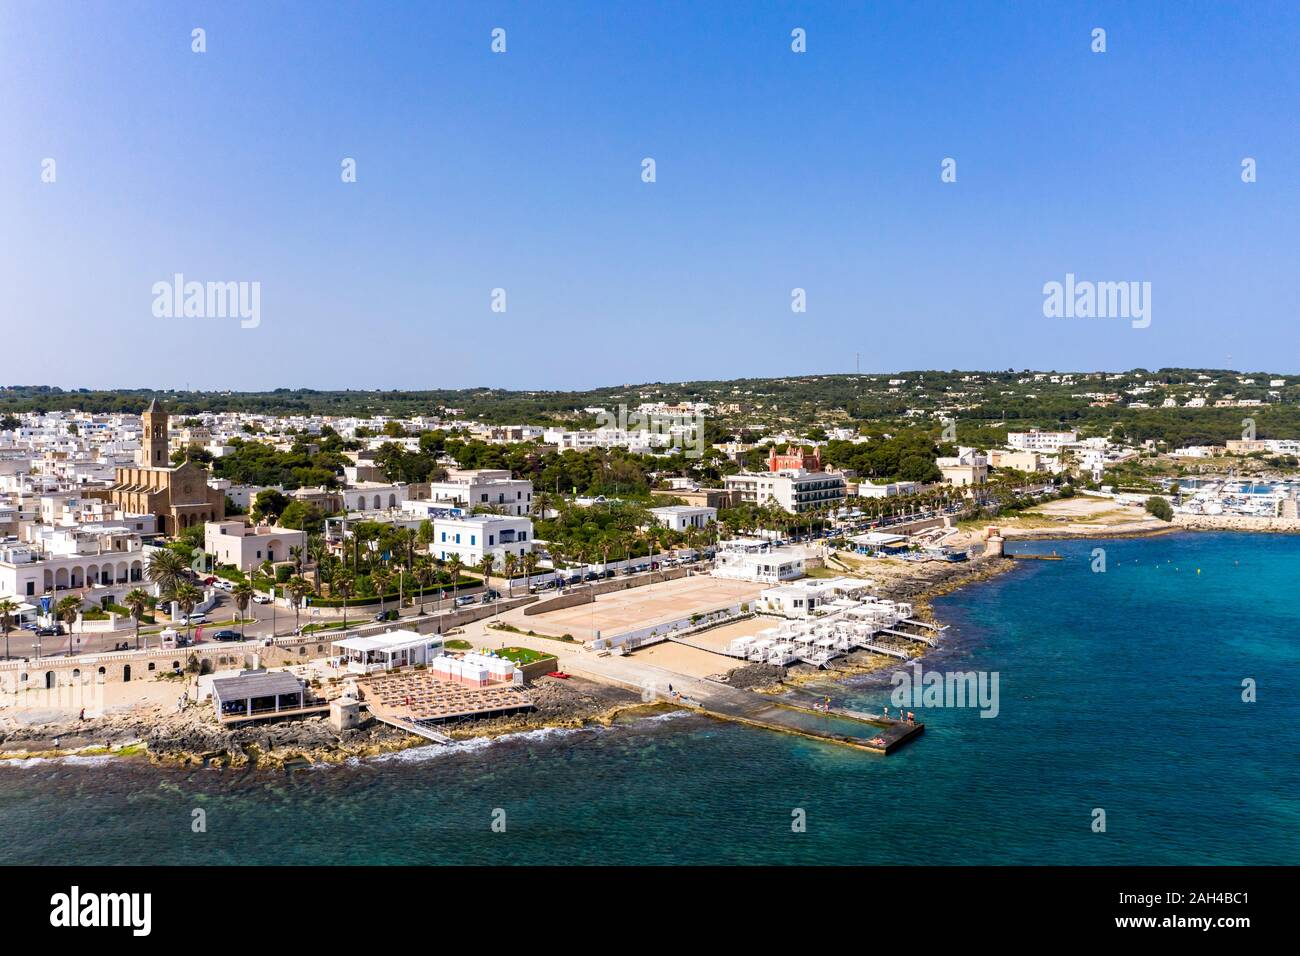 Italy, Apulia, Salento peninsula, Lecce province, Aerial view of Santa Maria di Leuca with harbor Stock Photo